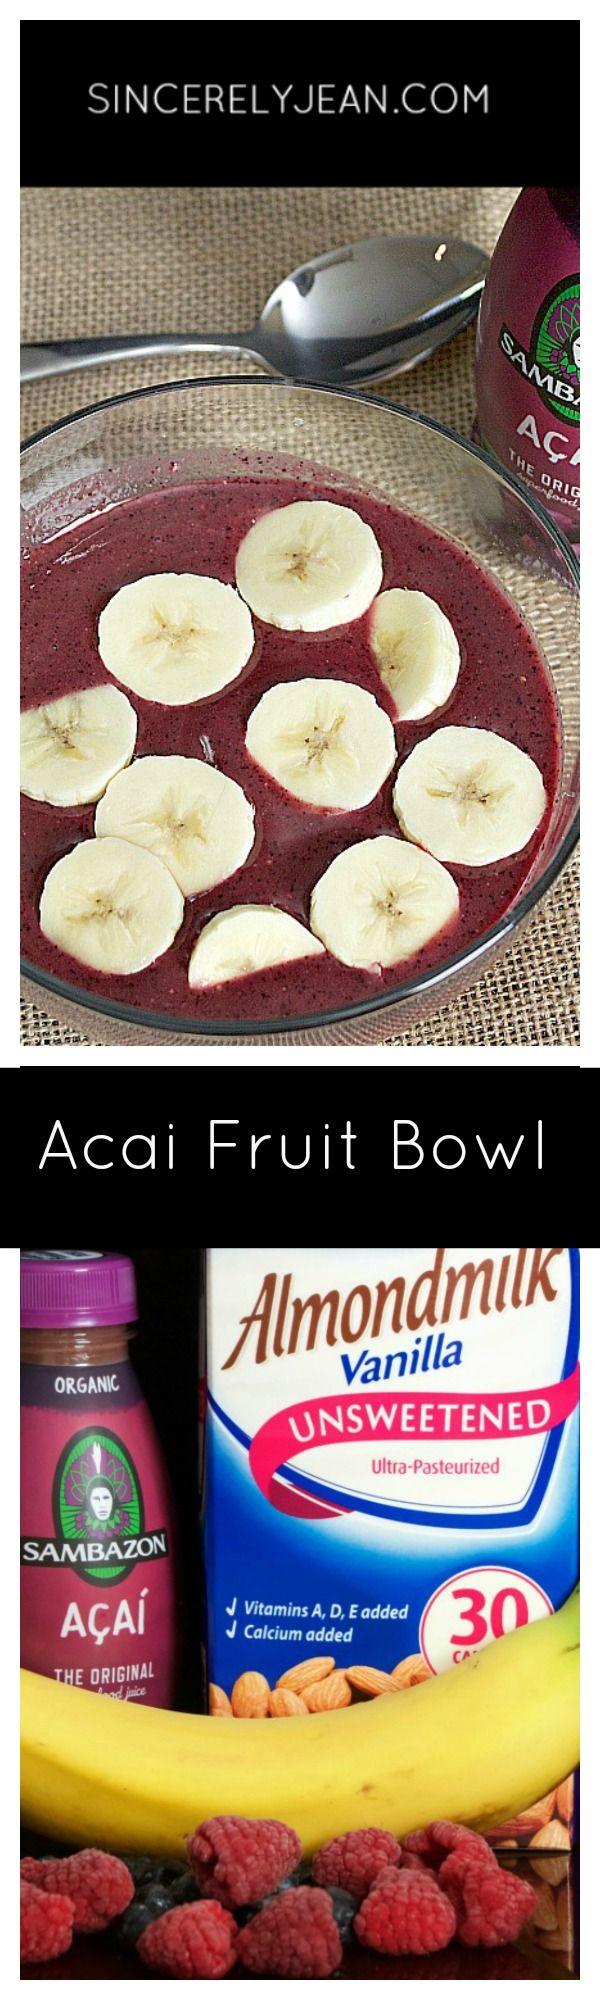 Acai fruit bowl for healthy breakfast or snack by SincerelyJean.com